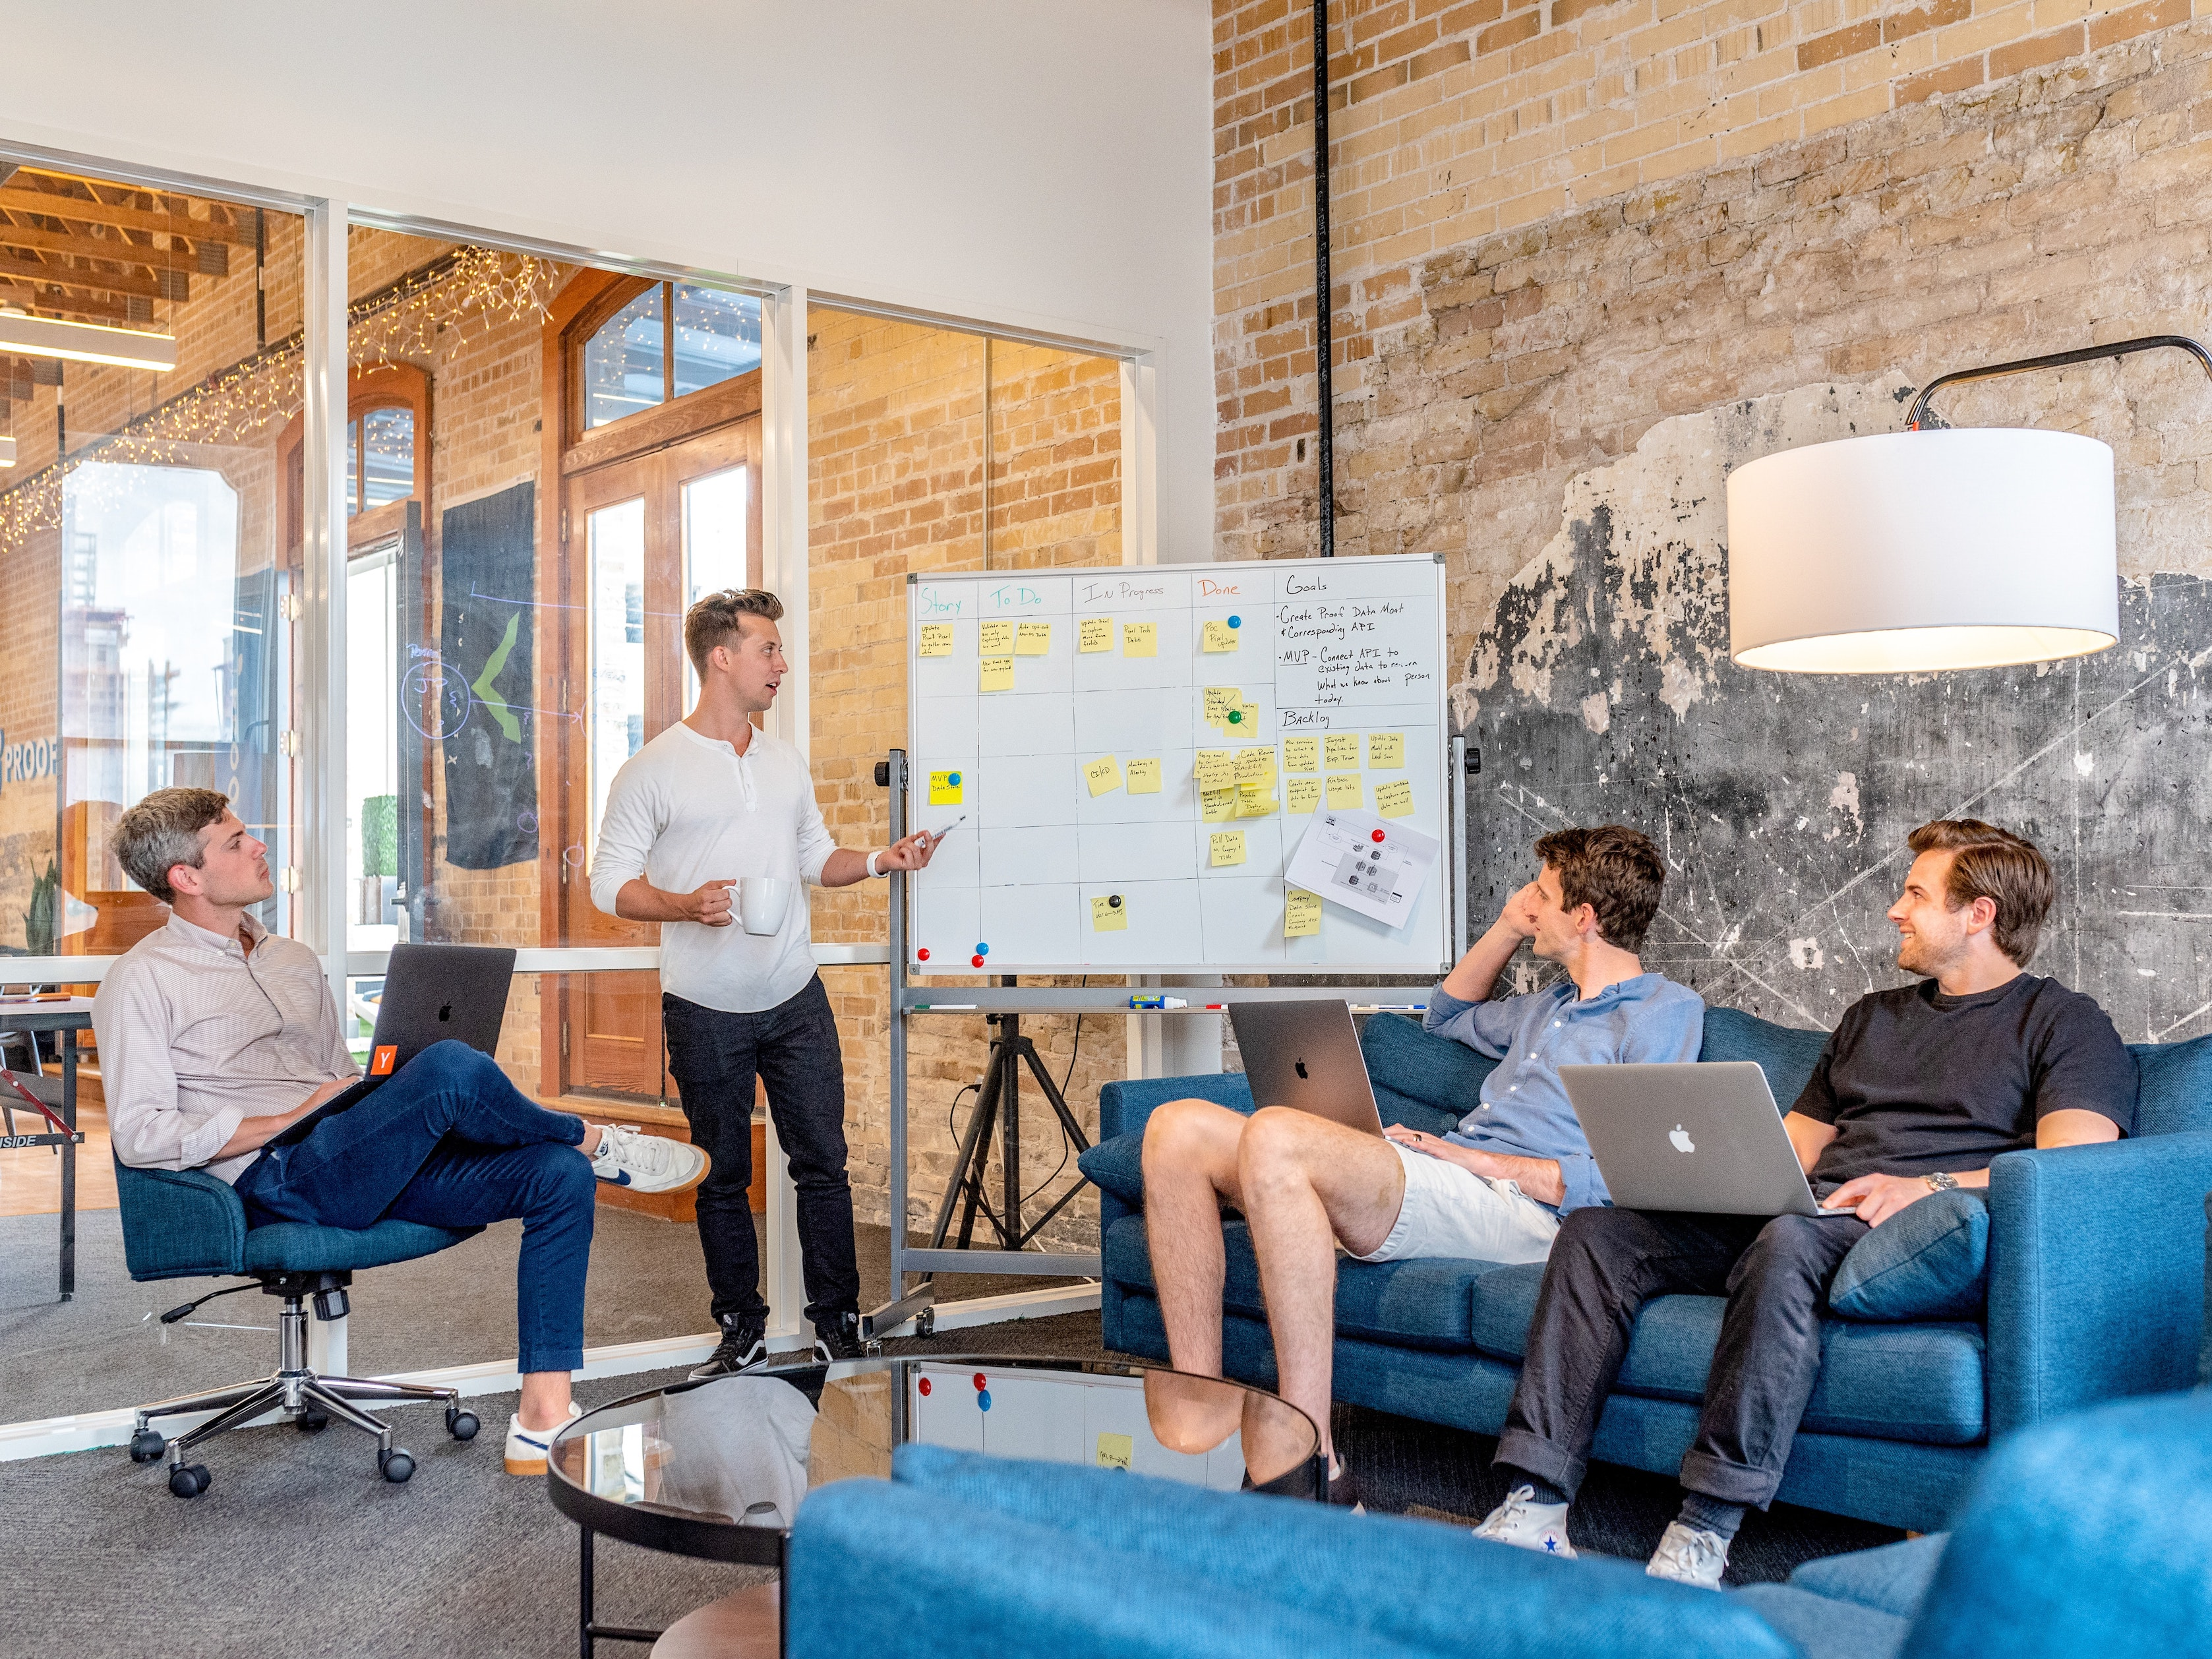 Startup firm human resource team meeting